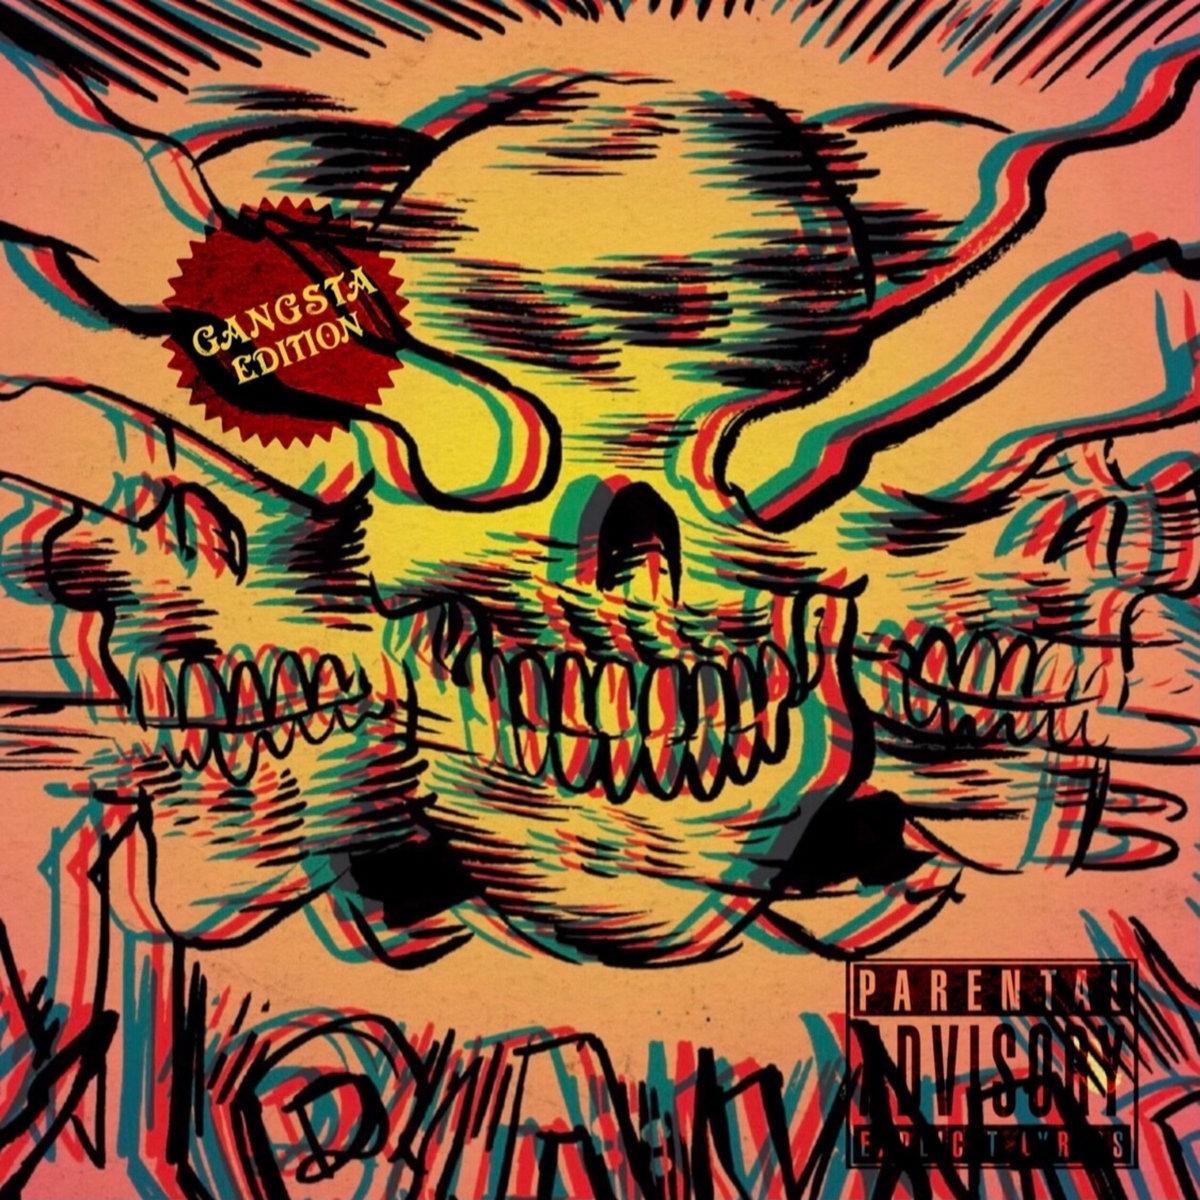 Jackie Scan, Bloodblixing - ACID TABZ GANGSTA EDITION EP